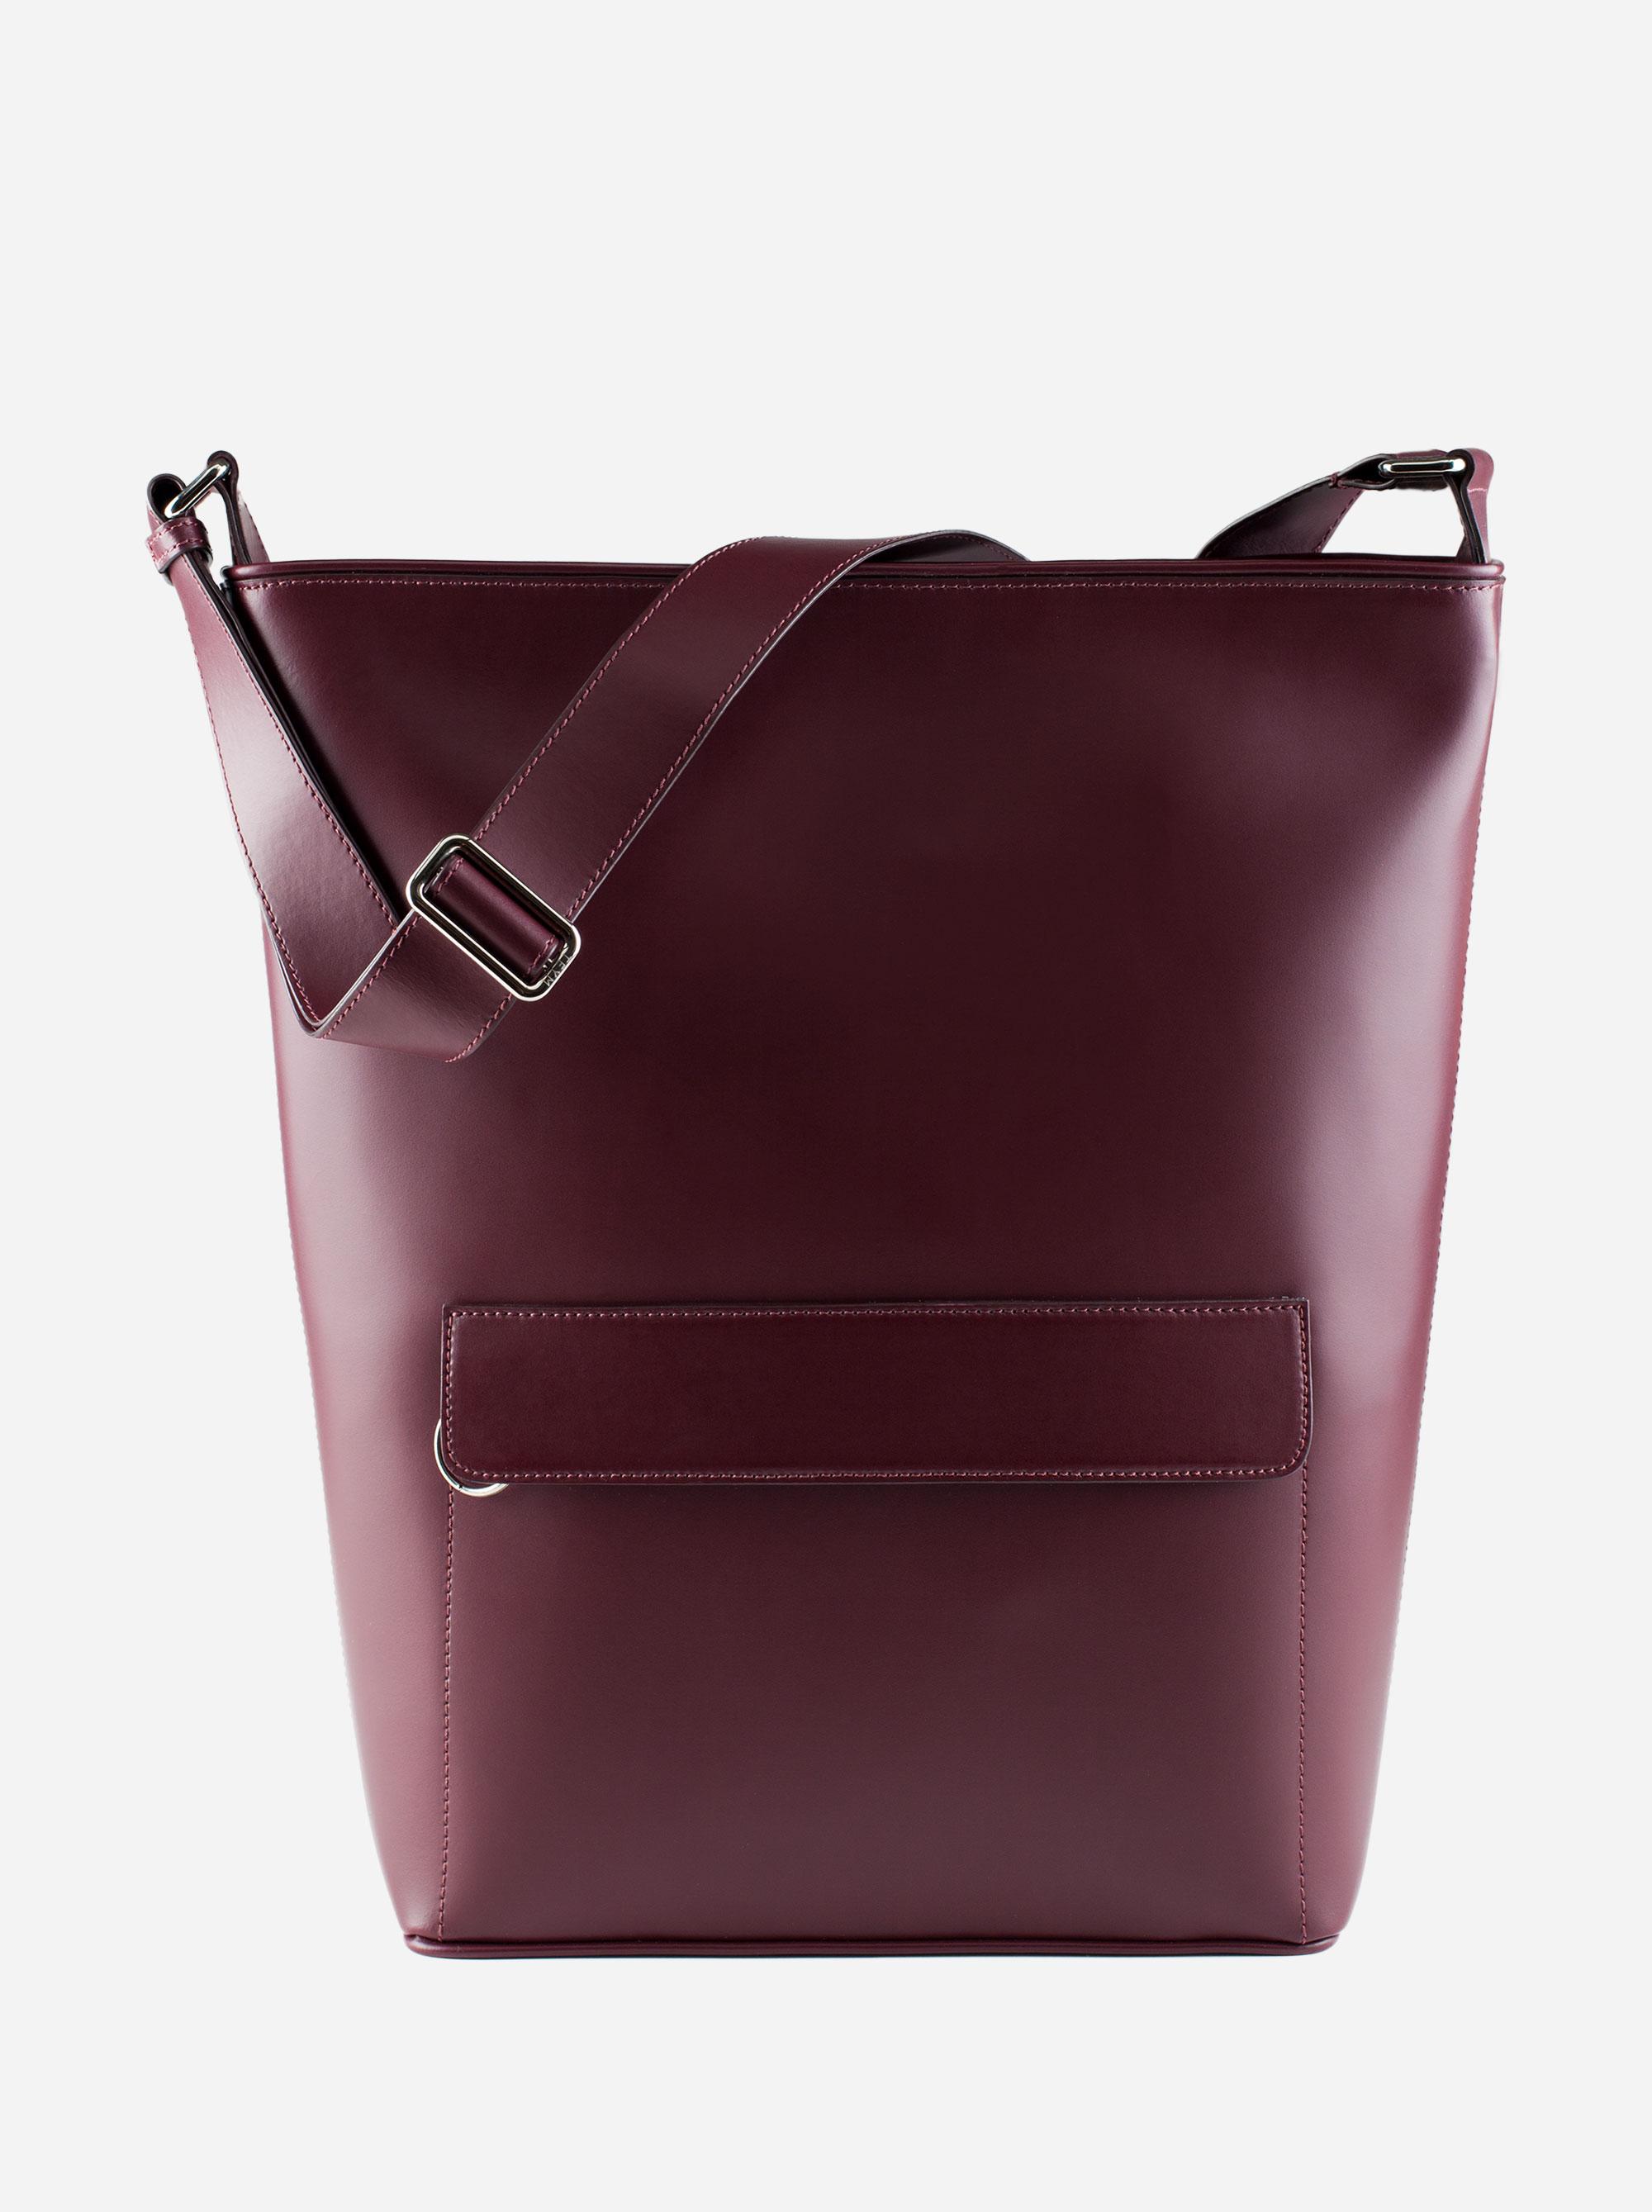 Teym - The Shoulder Bag - Burgundy - 1